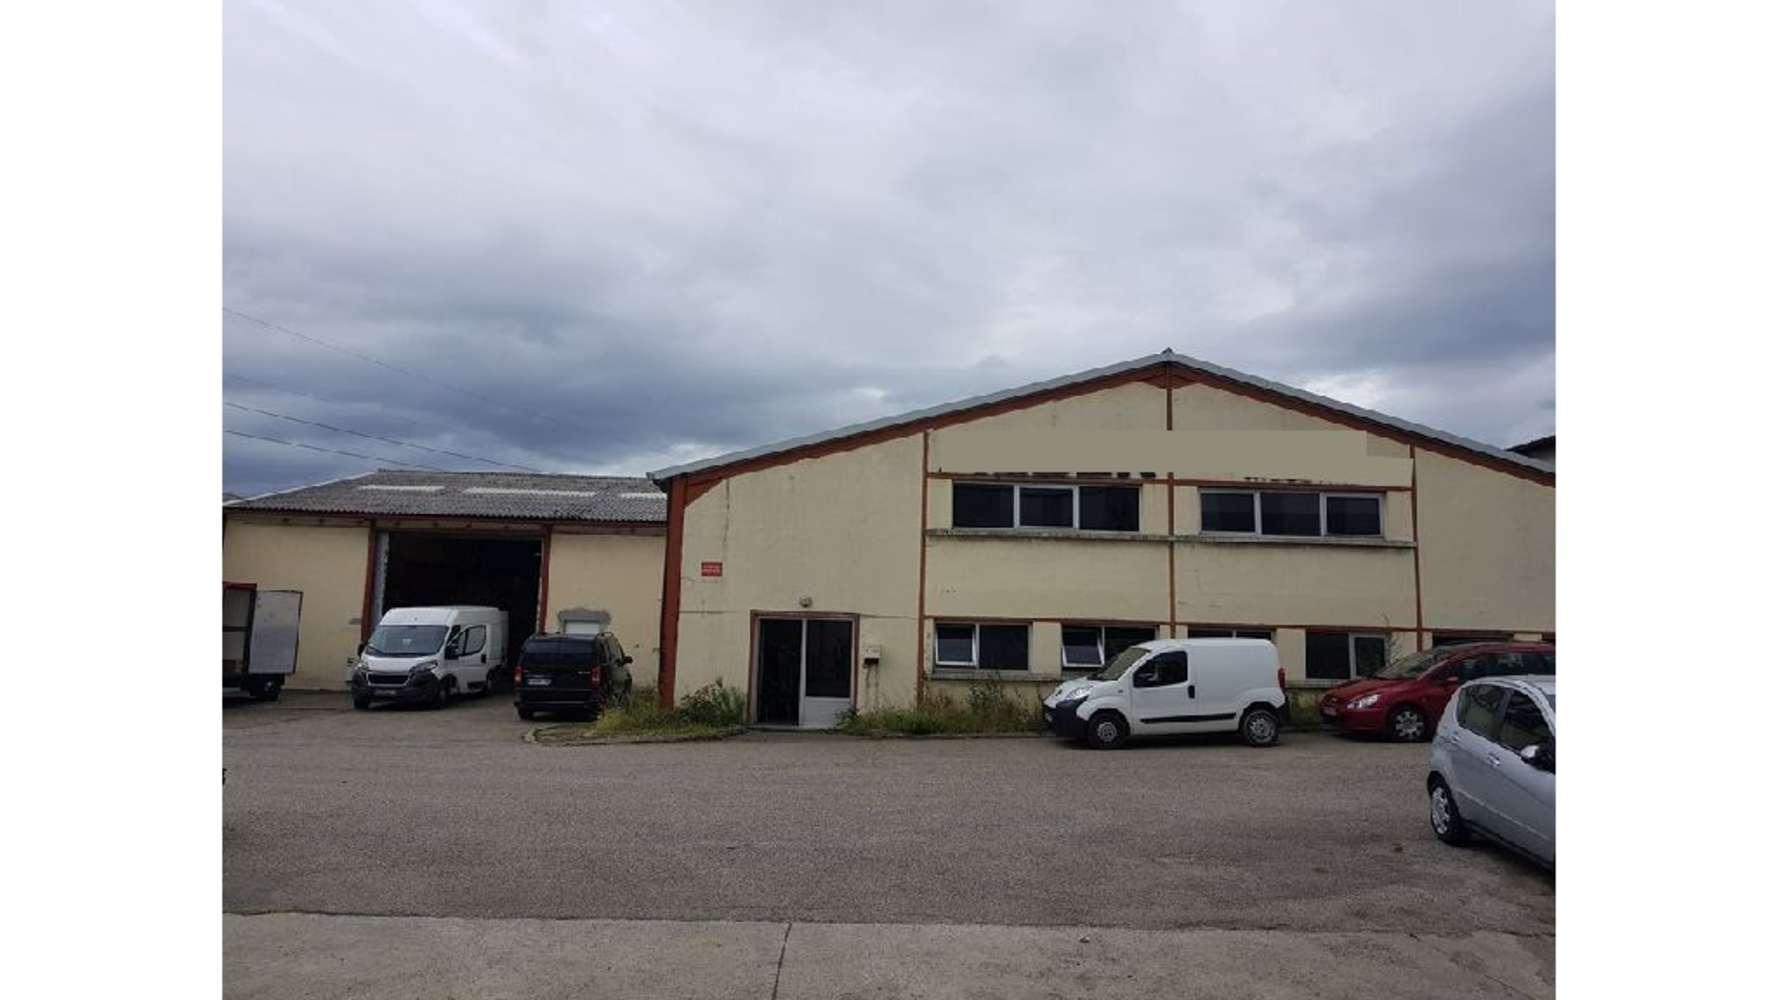 Activités/entrepôt Chassagny, 69700 - Vente entrepot Lyon / Chassagny (69) - 10067078